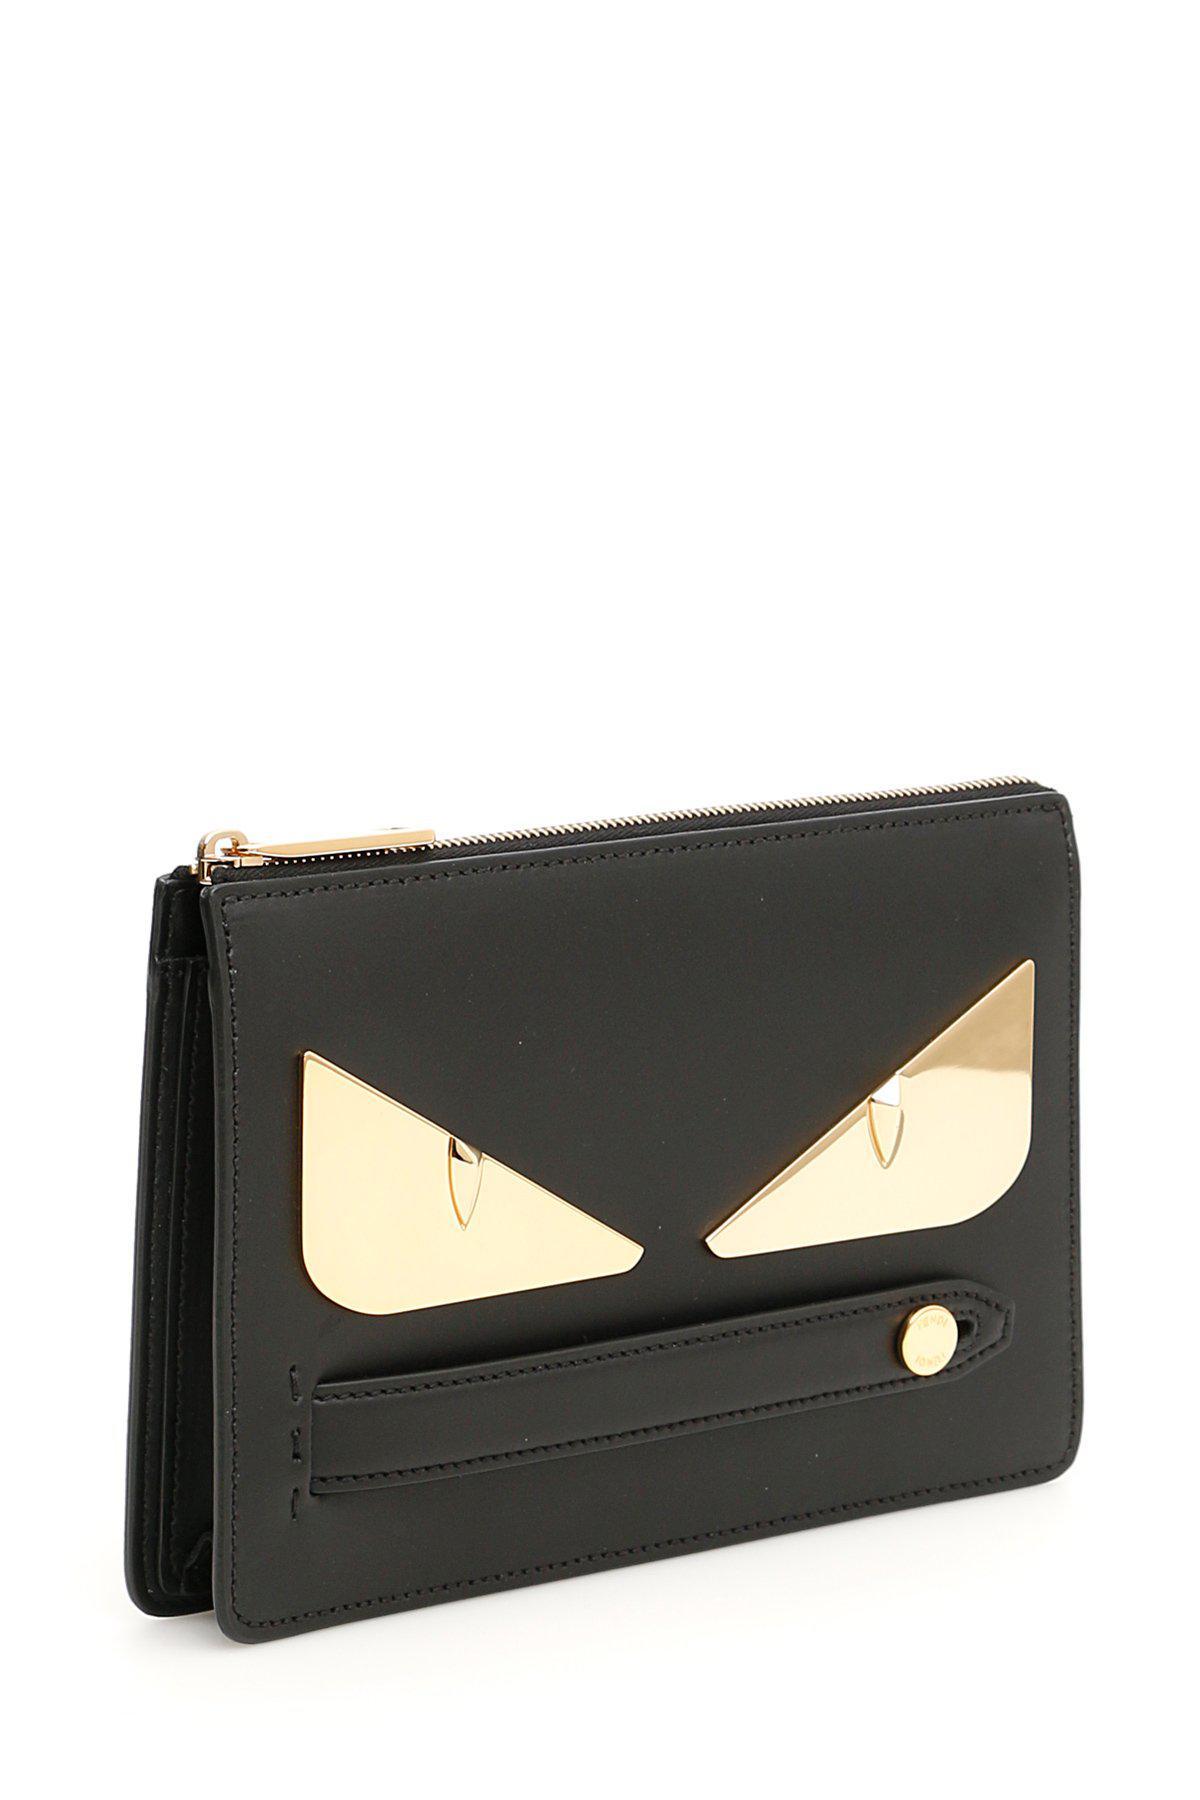 Lyst - Fendi Bag Bugs Clutch in Black 50d4f96f6dfaa